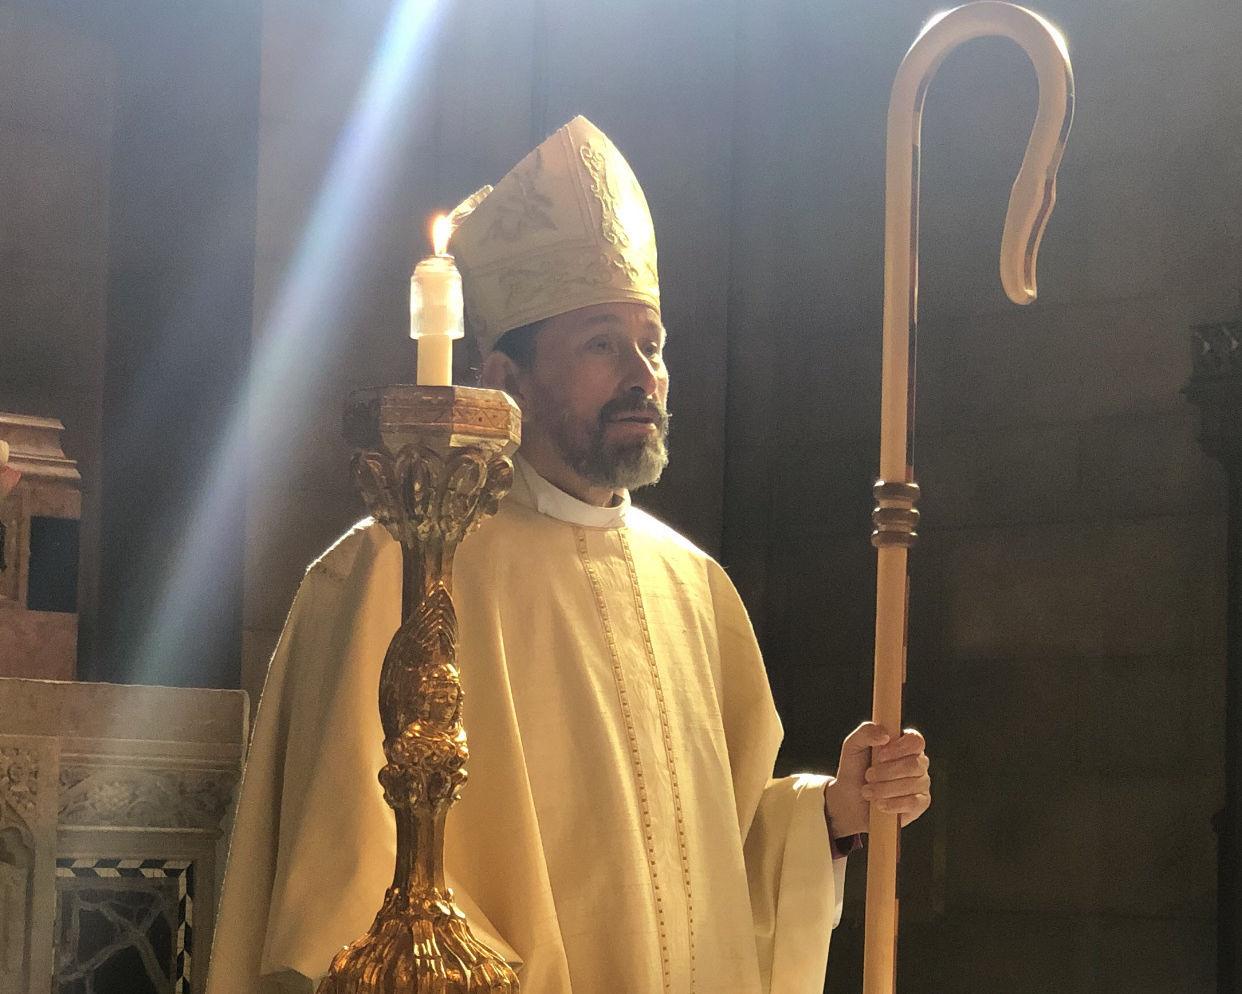 Bishop Daniel